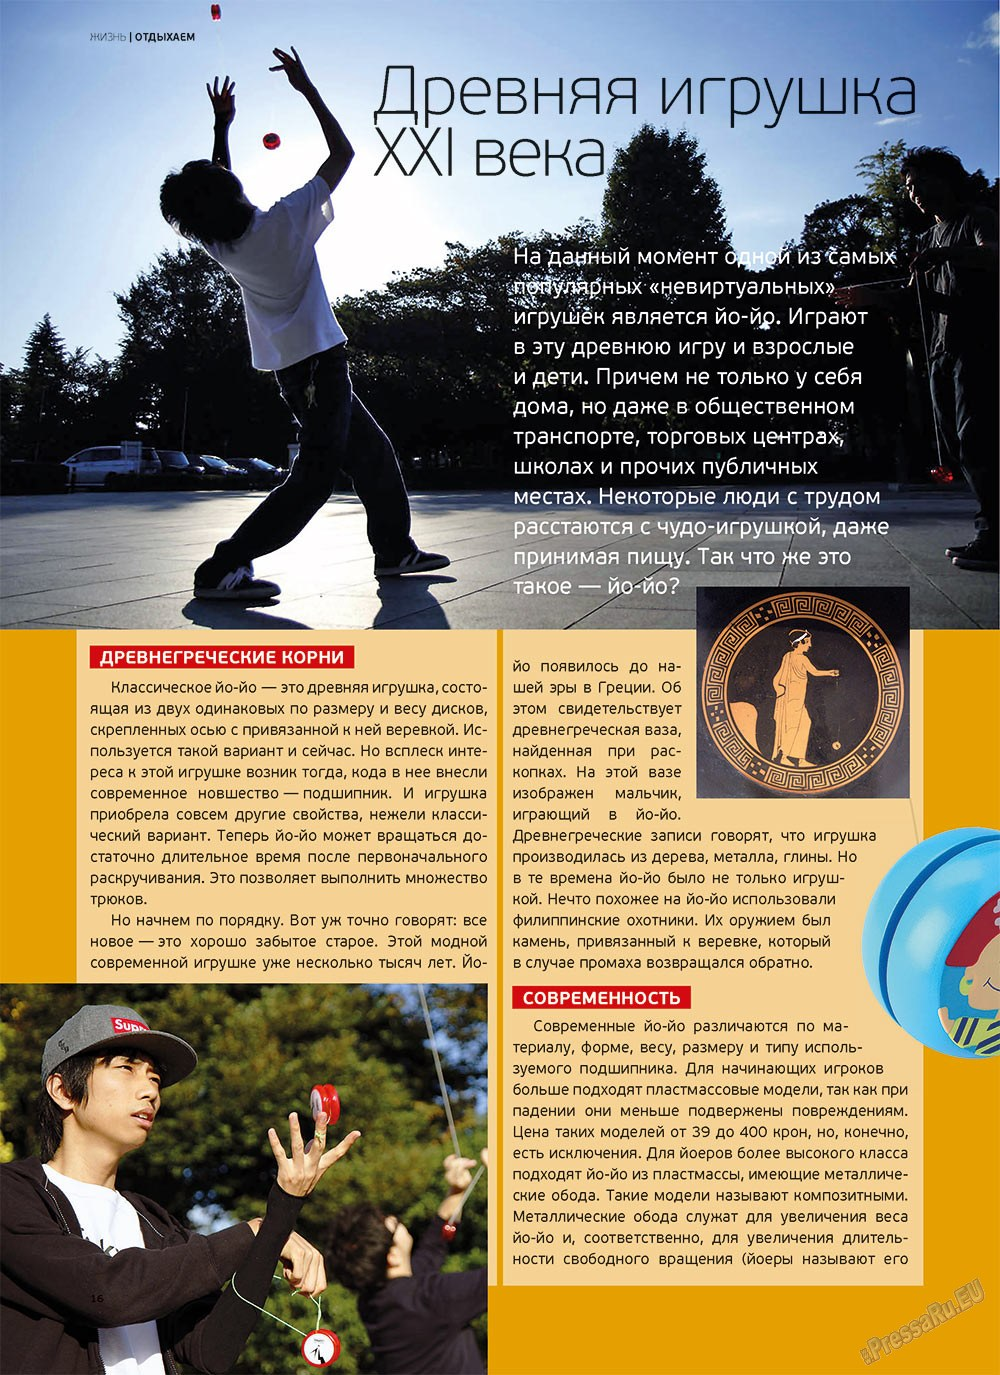 Артек (журнал). 2012 год, номер 5, стр. 18